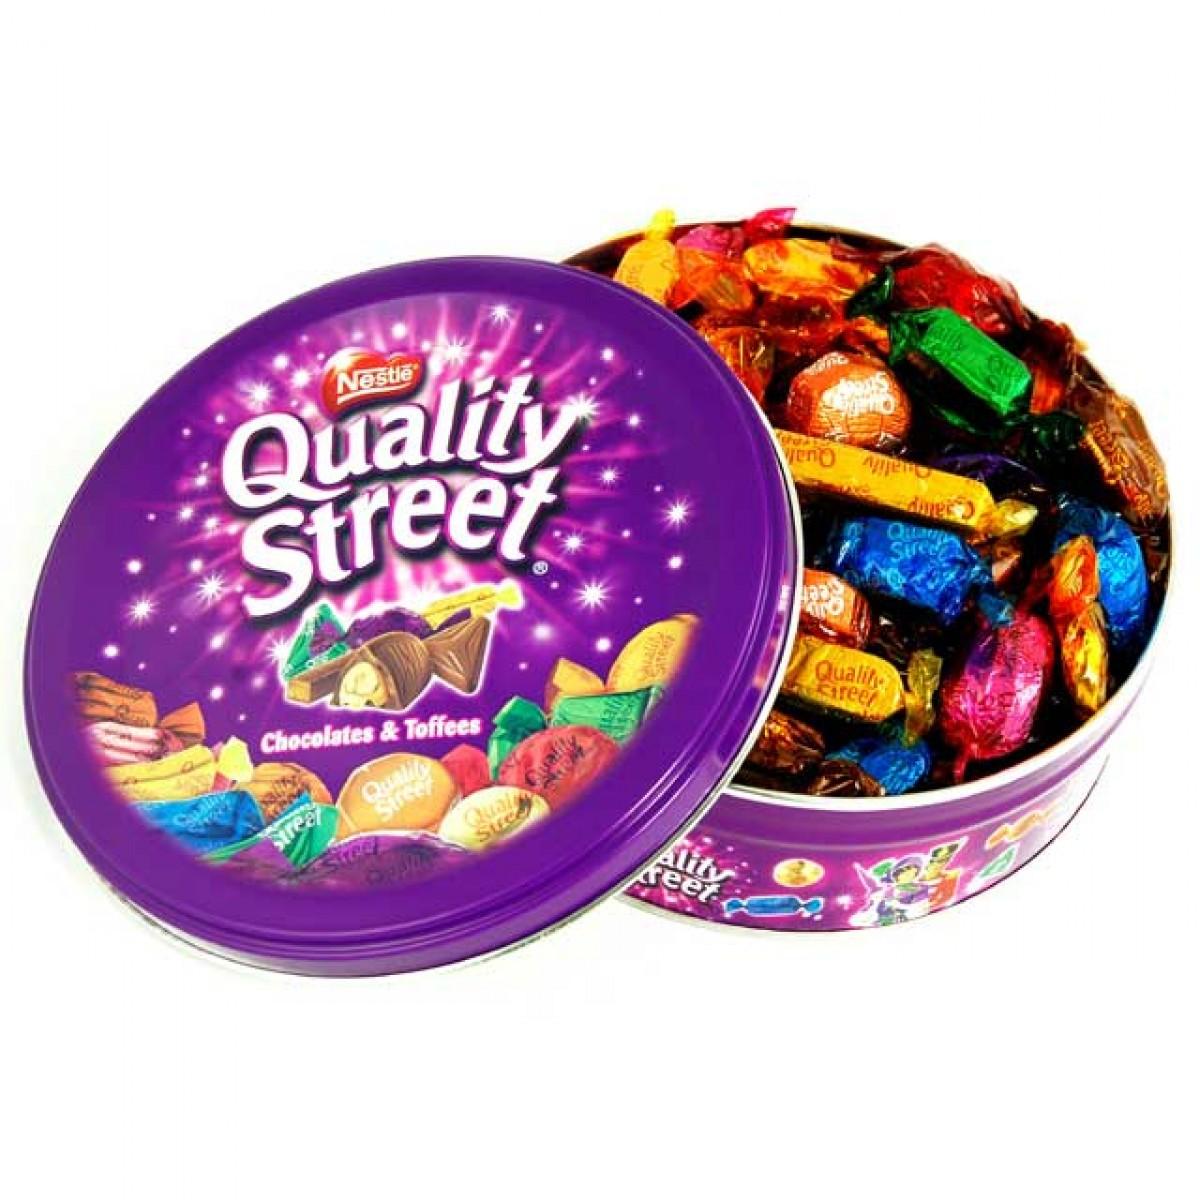 Send Gift to Kerala | Nestle Quality Street Chocolates & Toffees